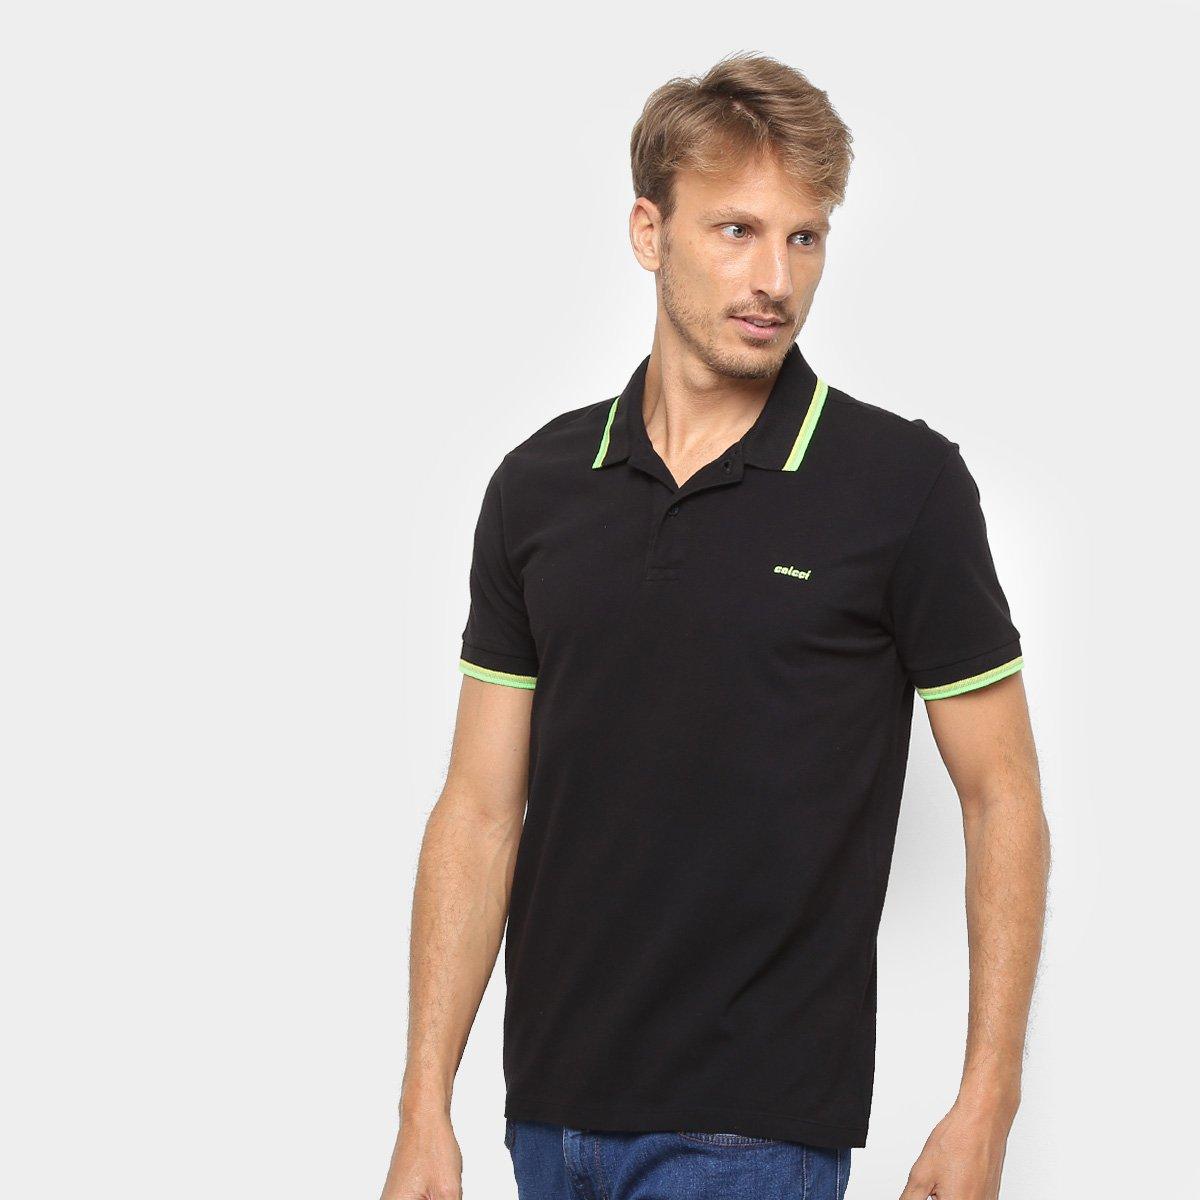 9bb461983 Camisa Polo Colcci Detalhe Neon Masculina